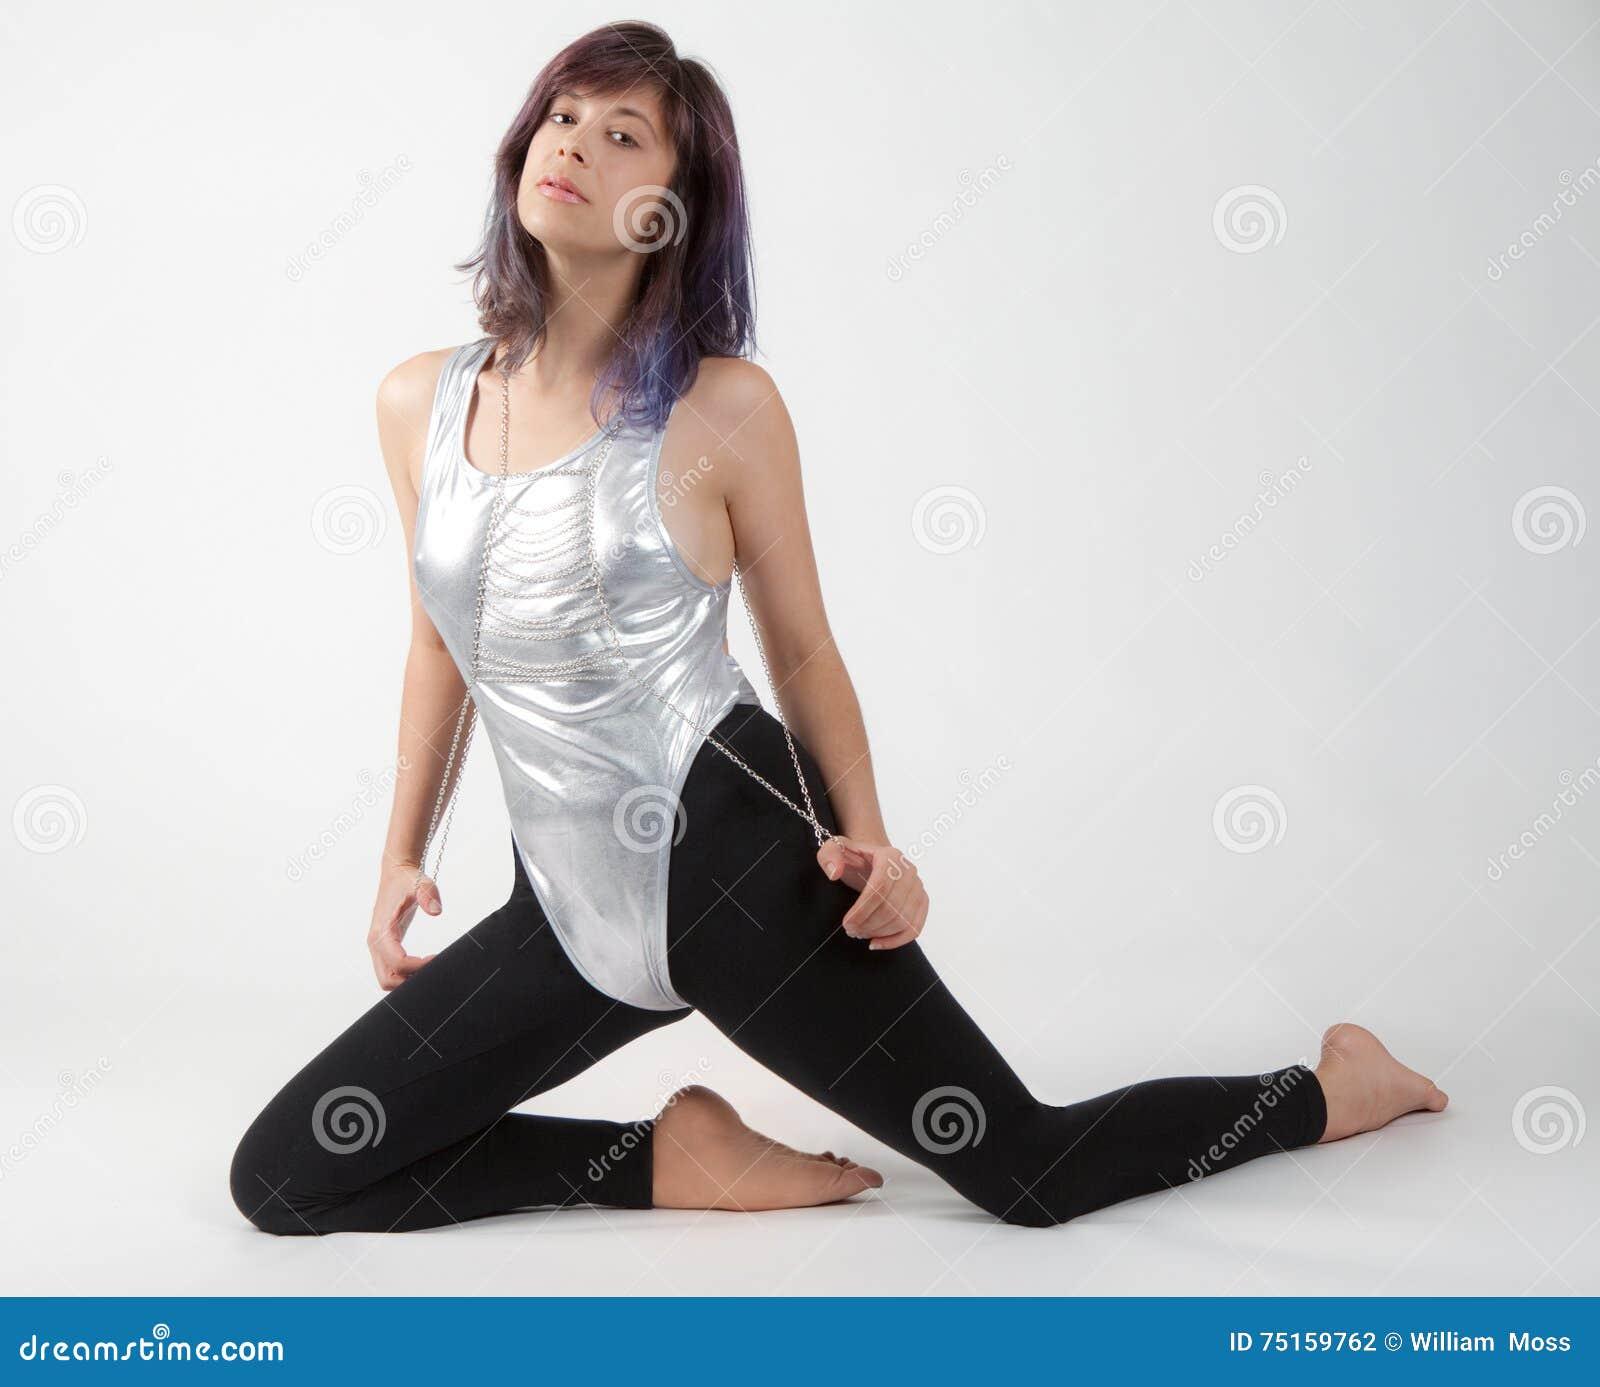 Fucking Samples Thin Woman In Leotard